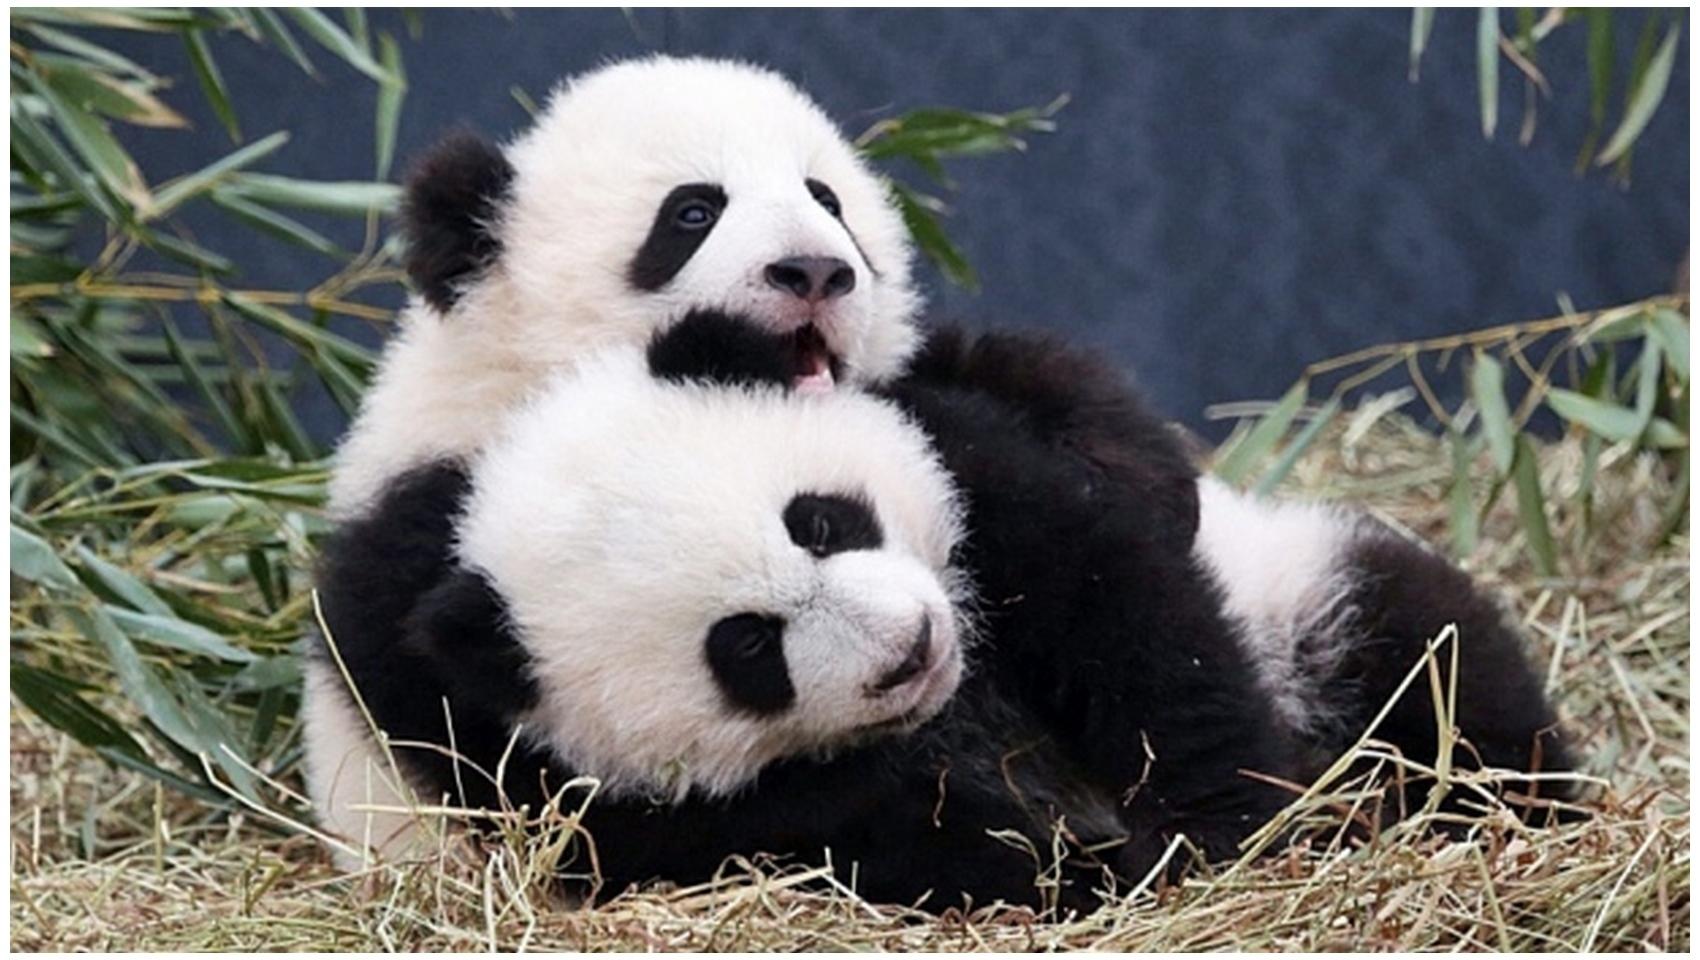 Two Loving Panda's Photos